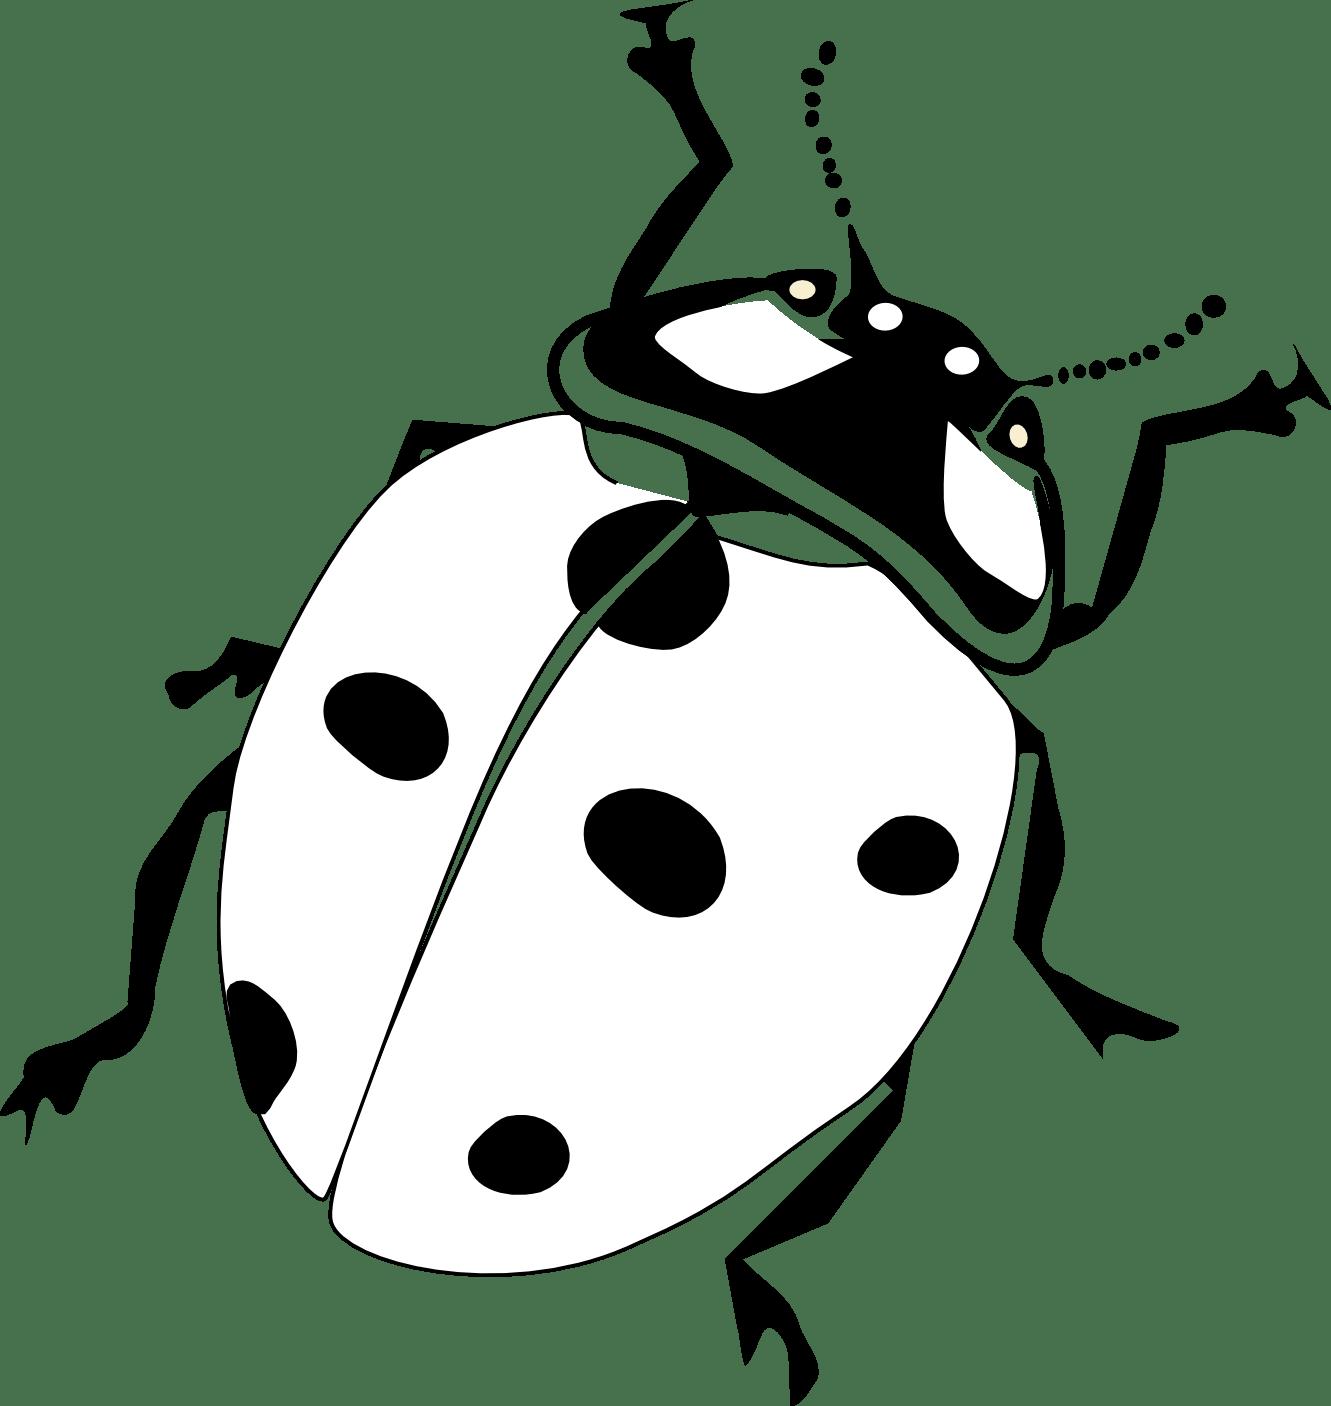 Ladybug Clipart Black And White Clipart Panda